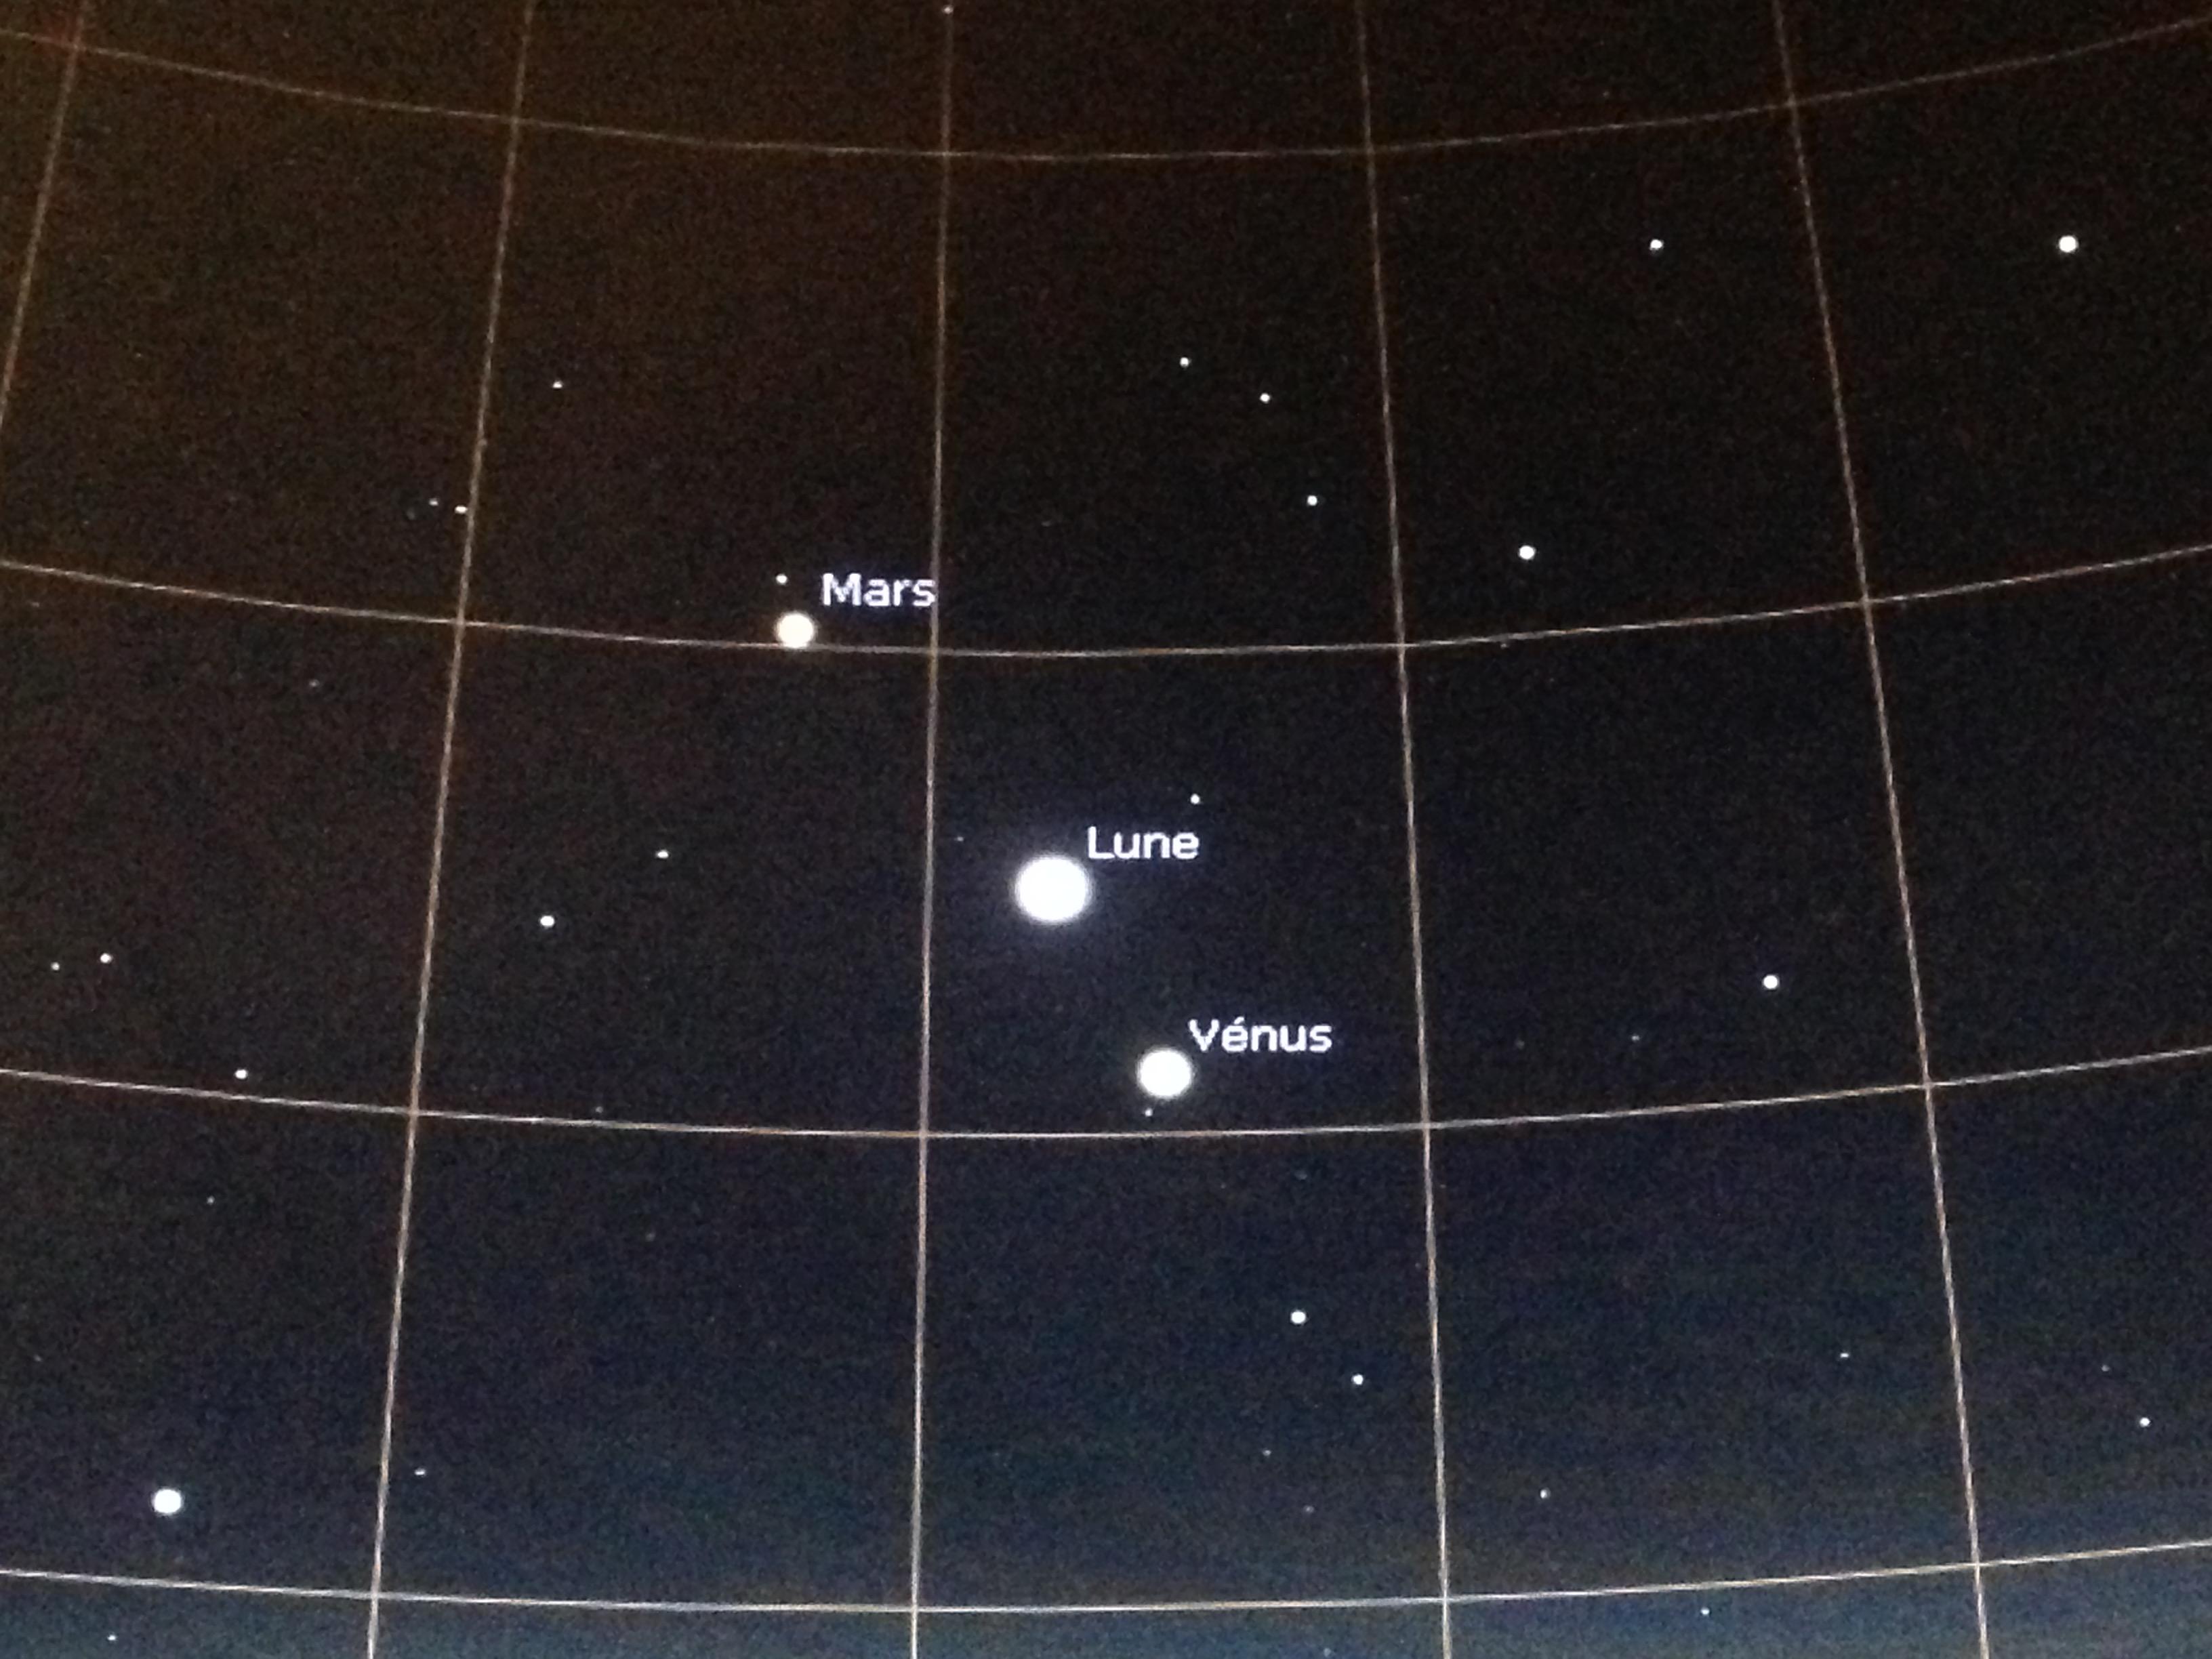 carte stellarium en 2017 Lune Vénus Mars